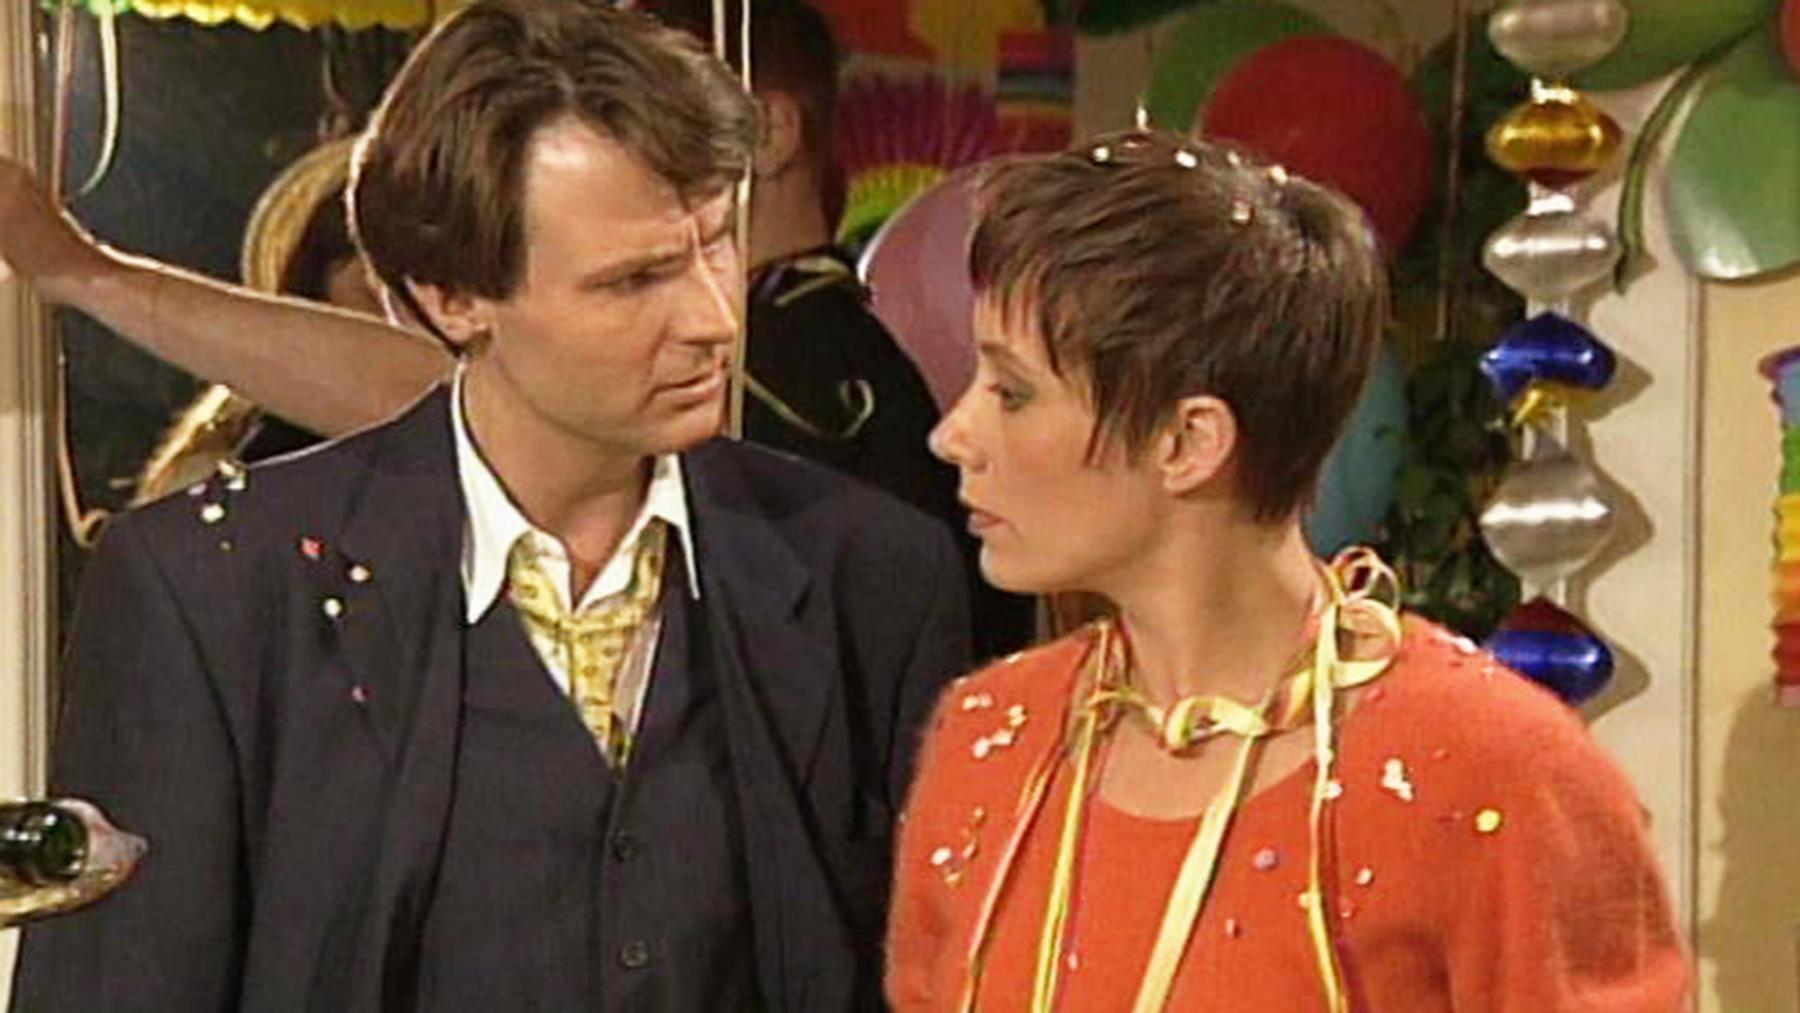 Tom benimmt sich gegenüber Saskia merkwürdig.